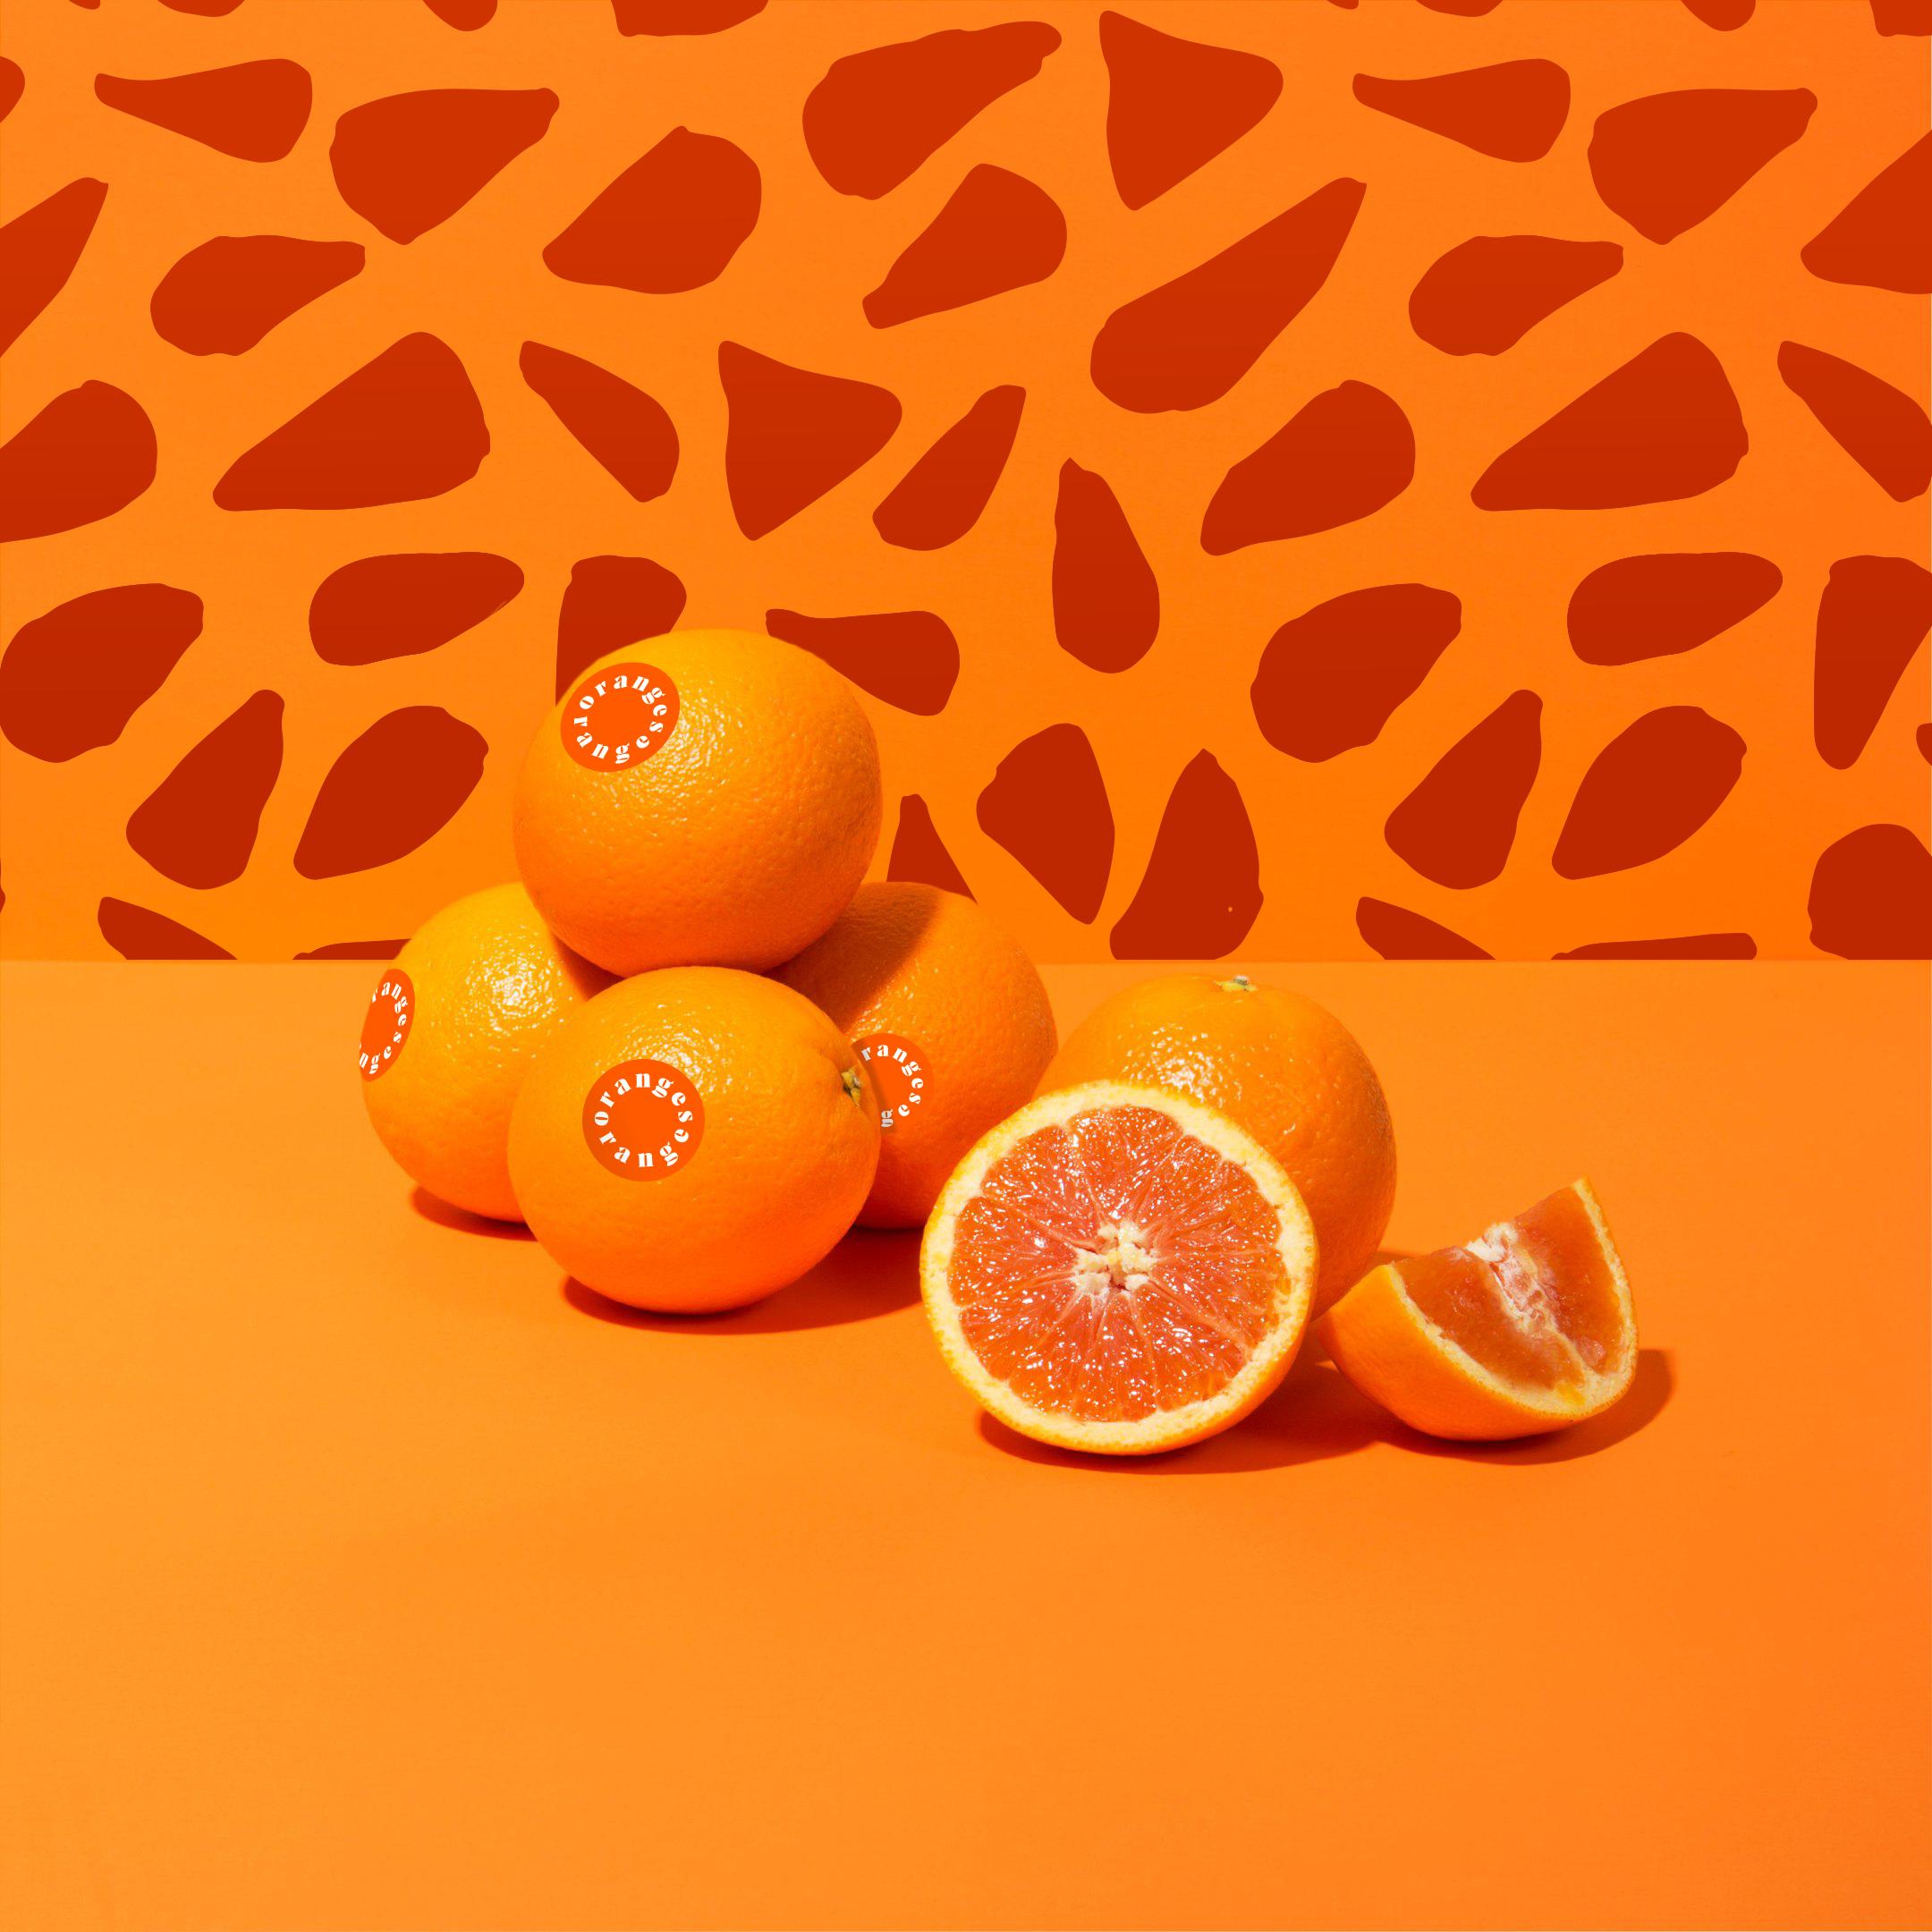 orangesstickers.png